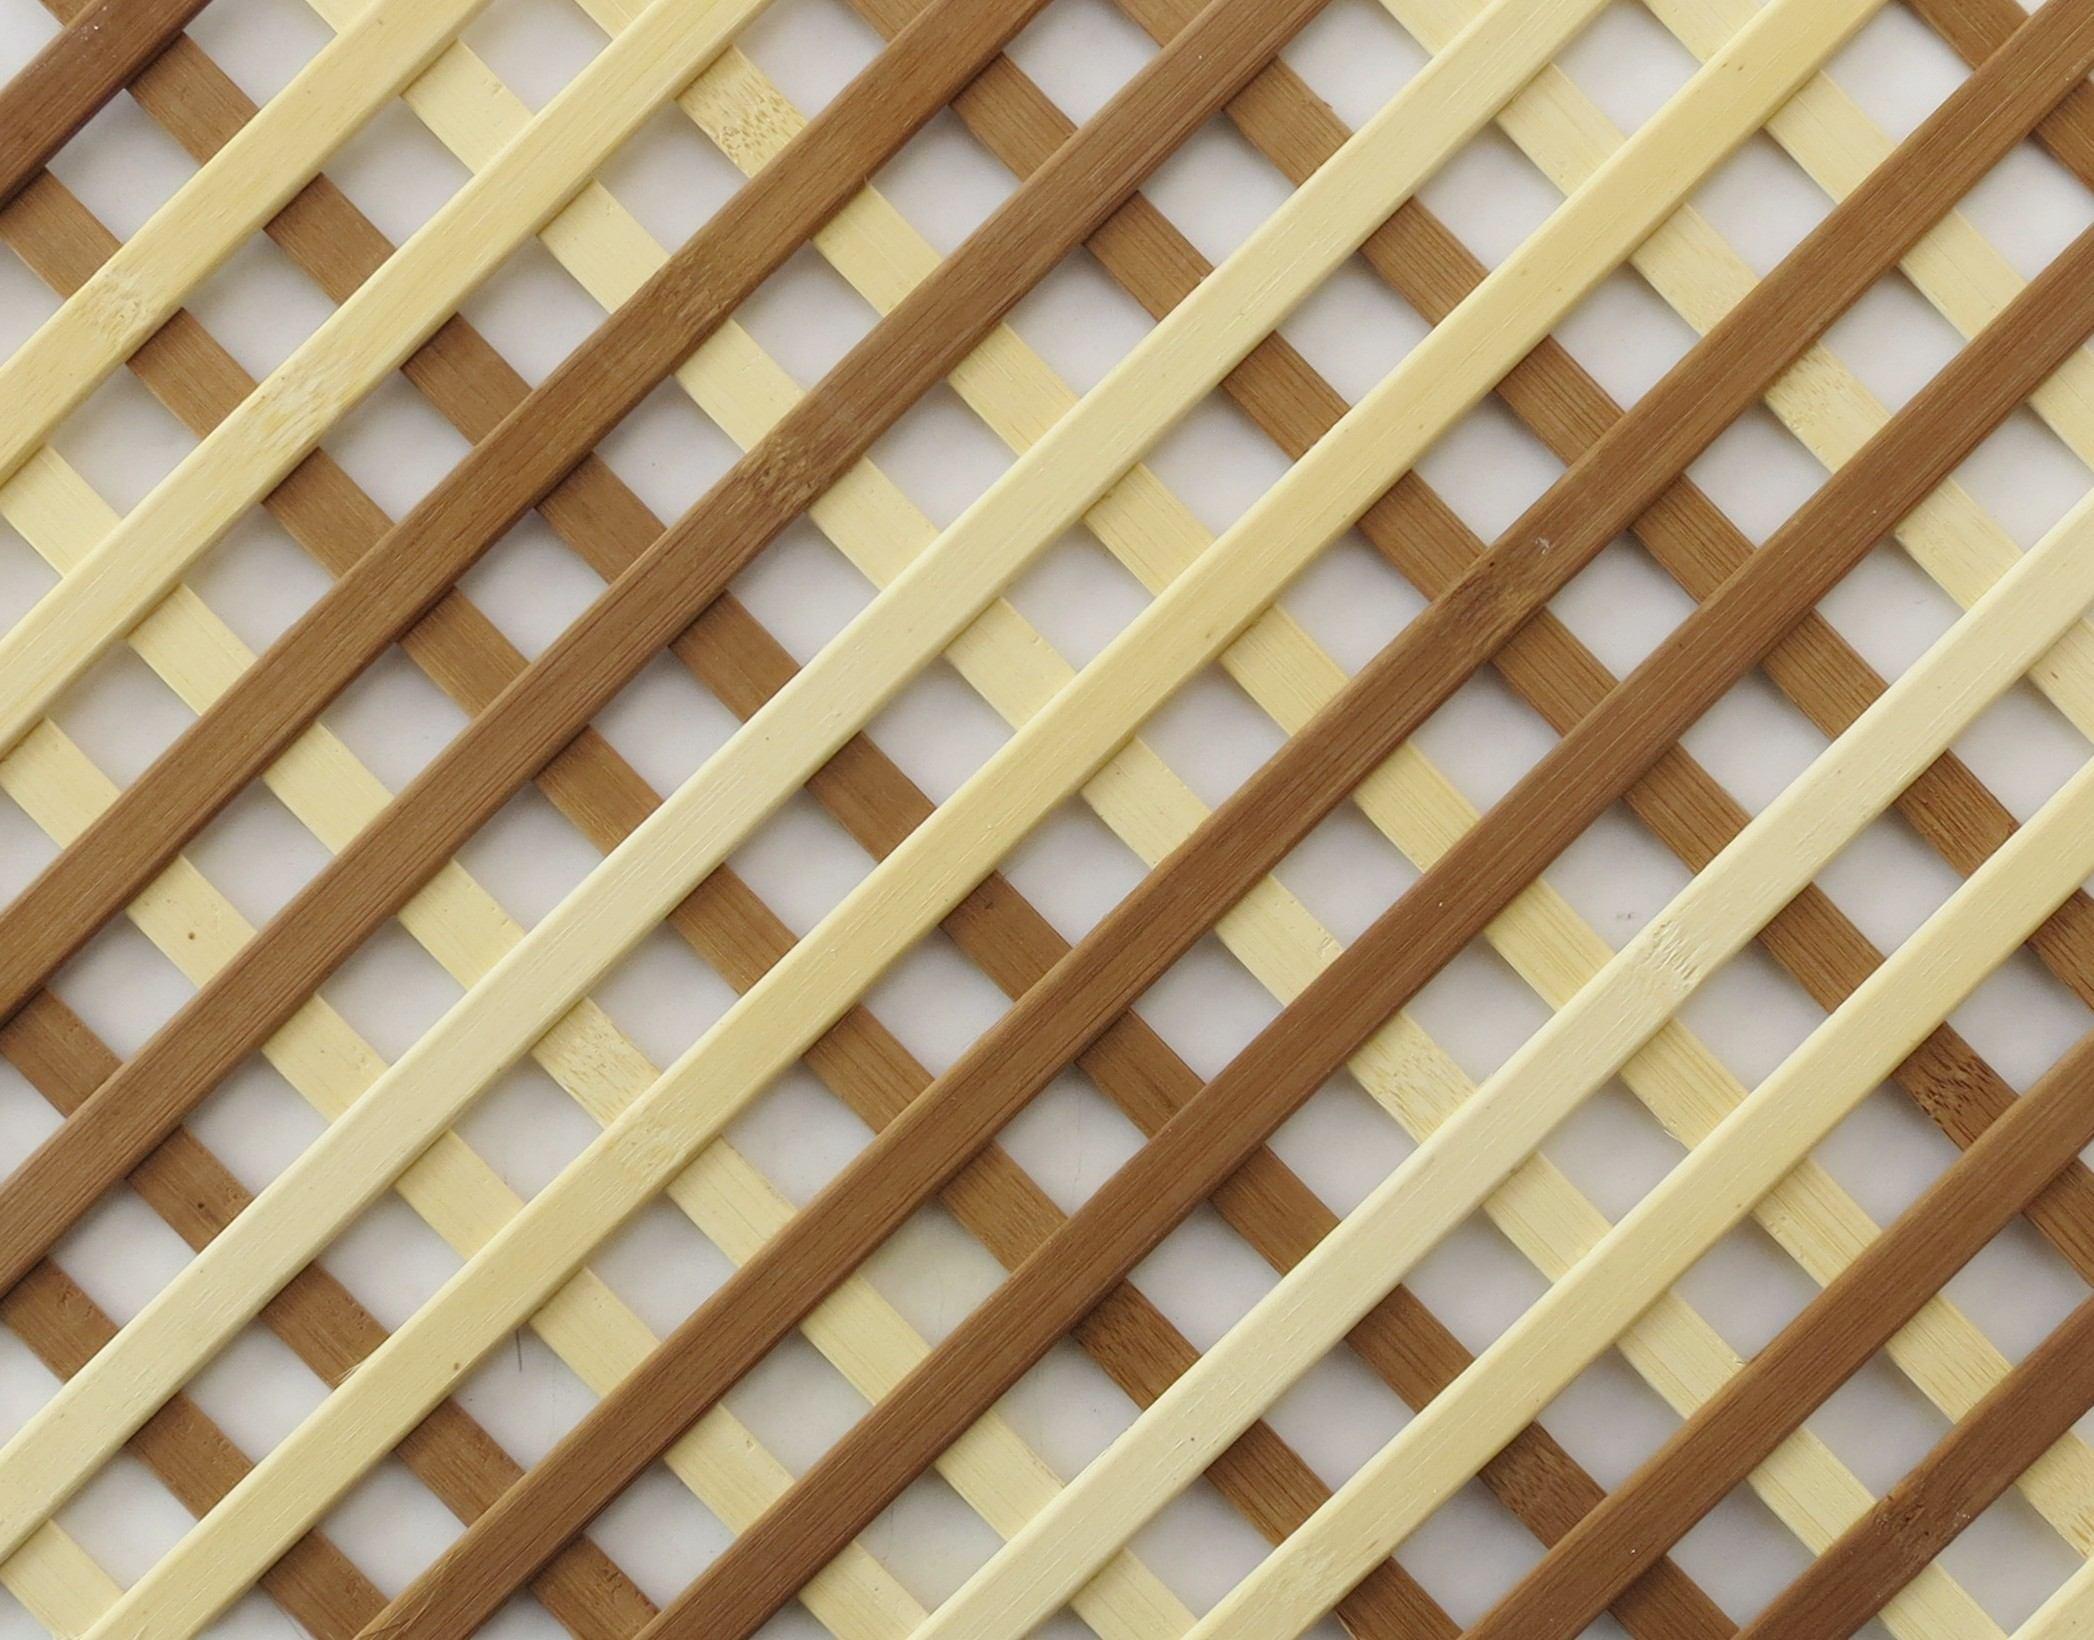 Wooden lattice grille panel for Wood lattice trellis